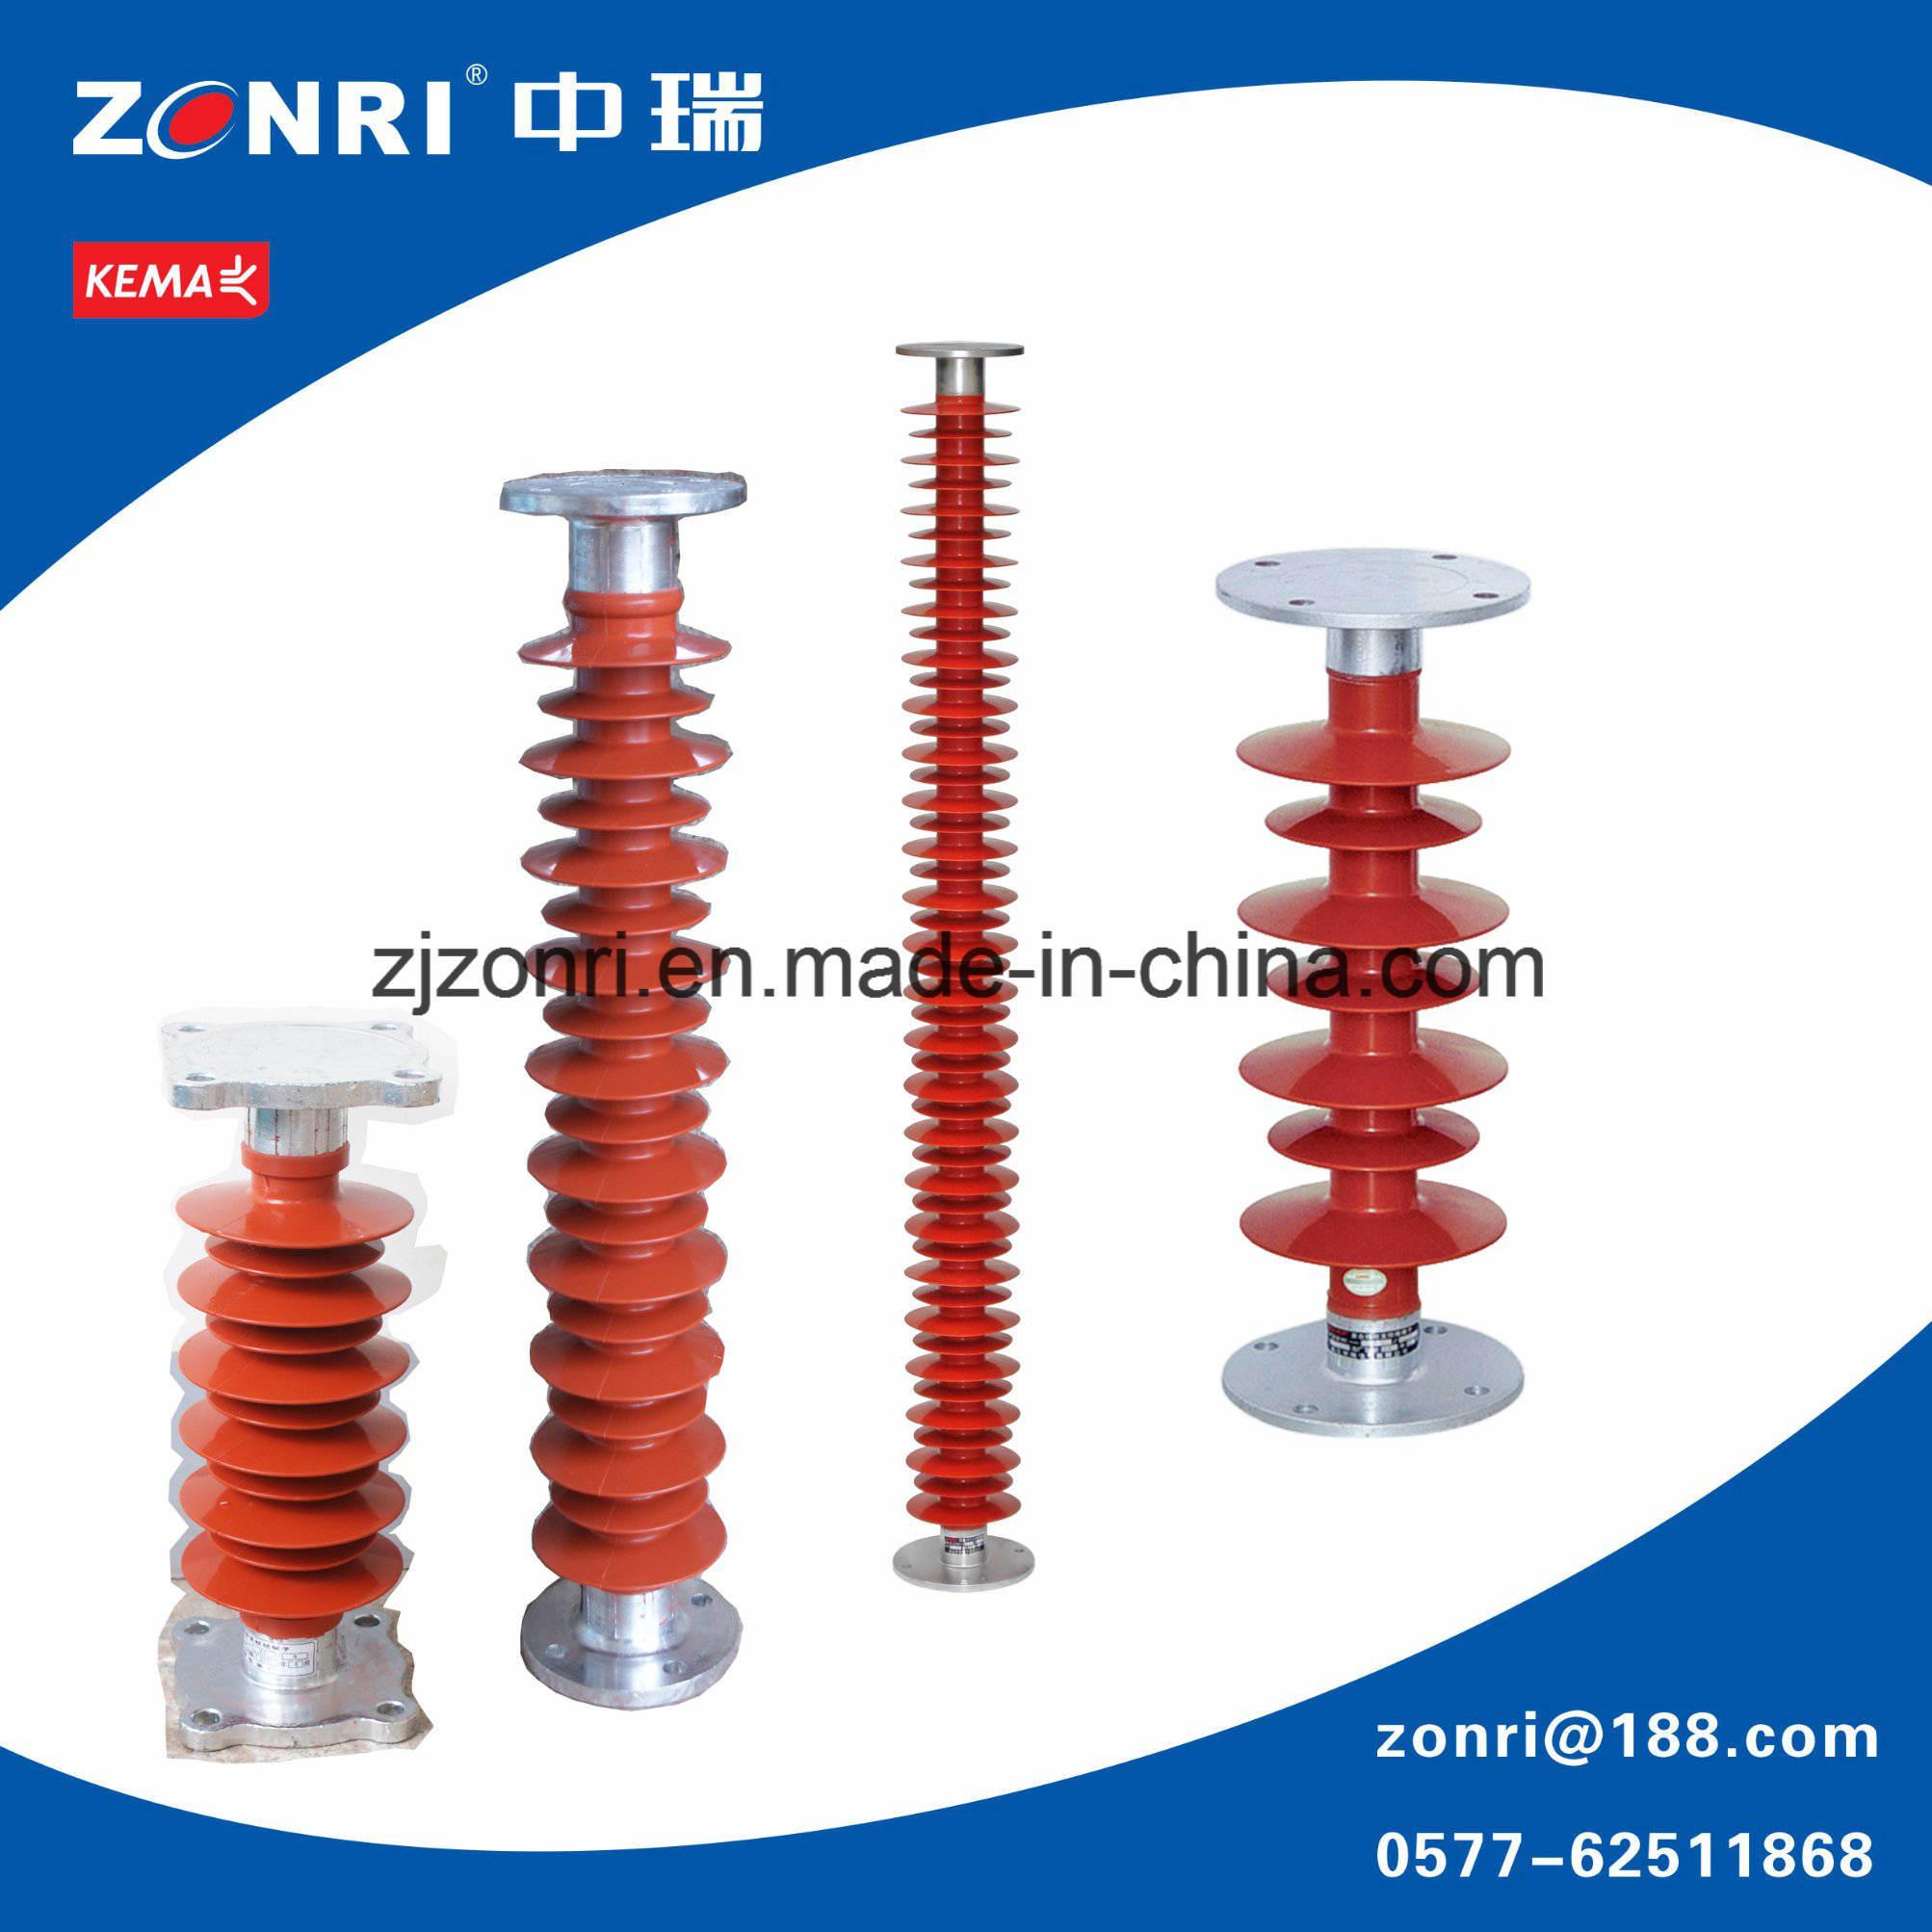 Composite Post Insulator (FZSW-35/8) 35kv 8kn